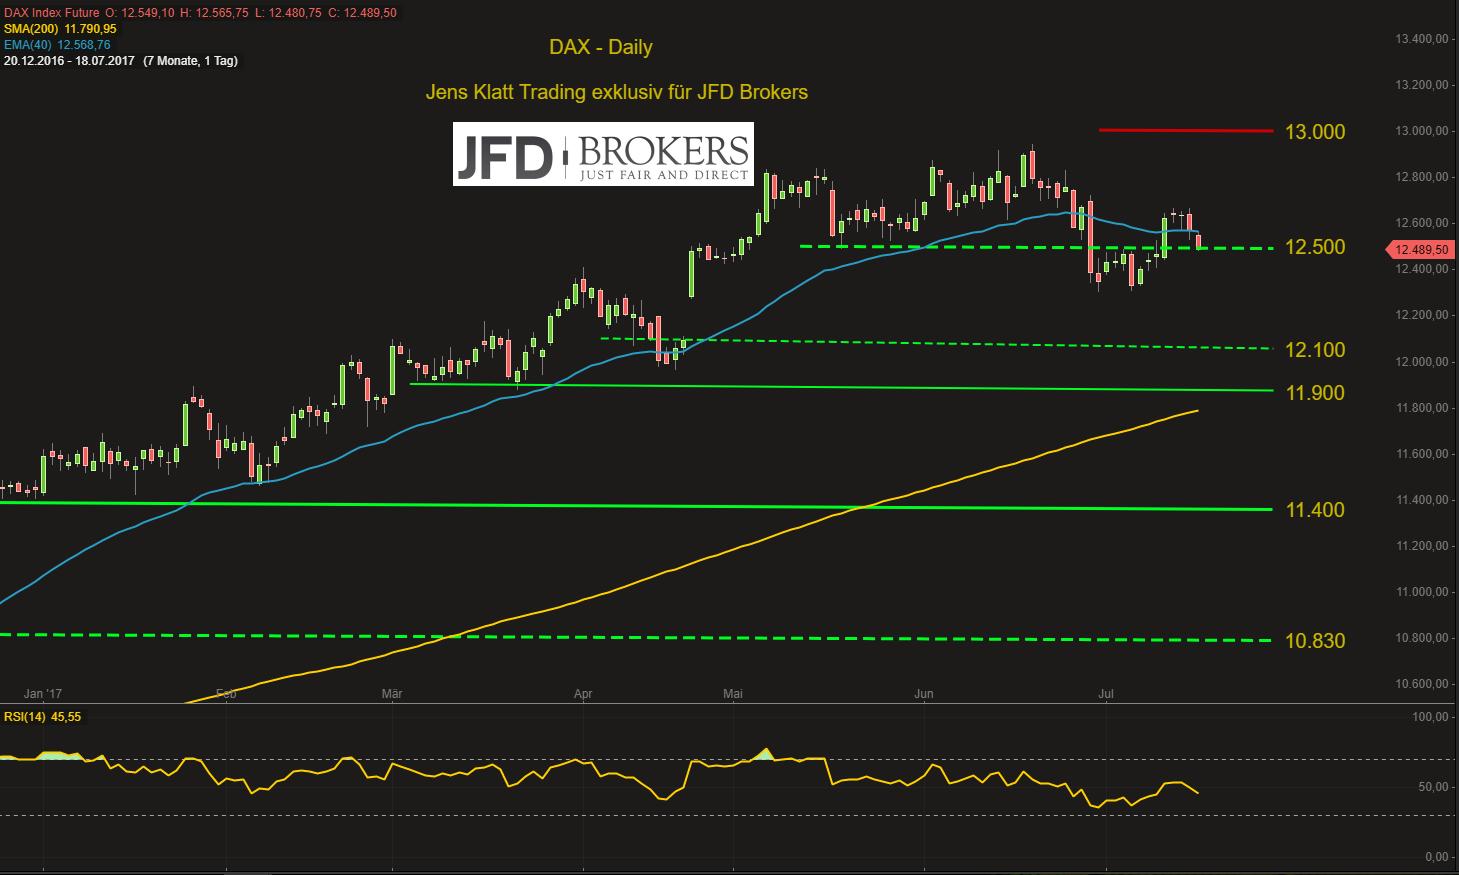 Starker-Euro-schwacher-DAX-interveniert-die-EZB-am-Donnerstag-Kommentar-JFD-Brokers-GodmodeTrader.de-2